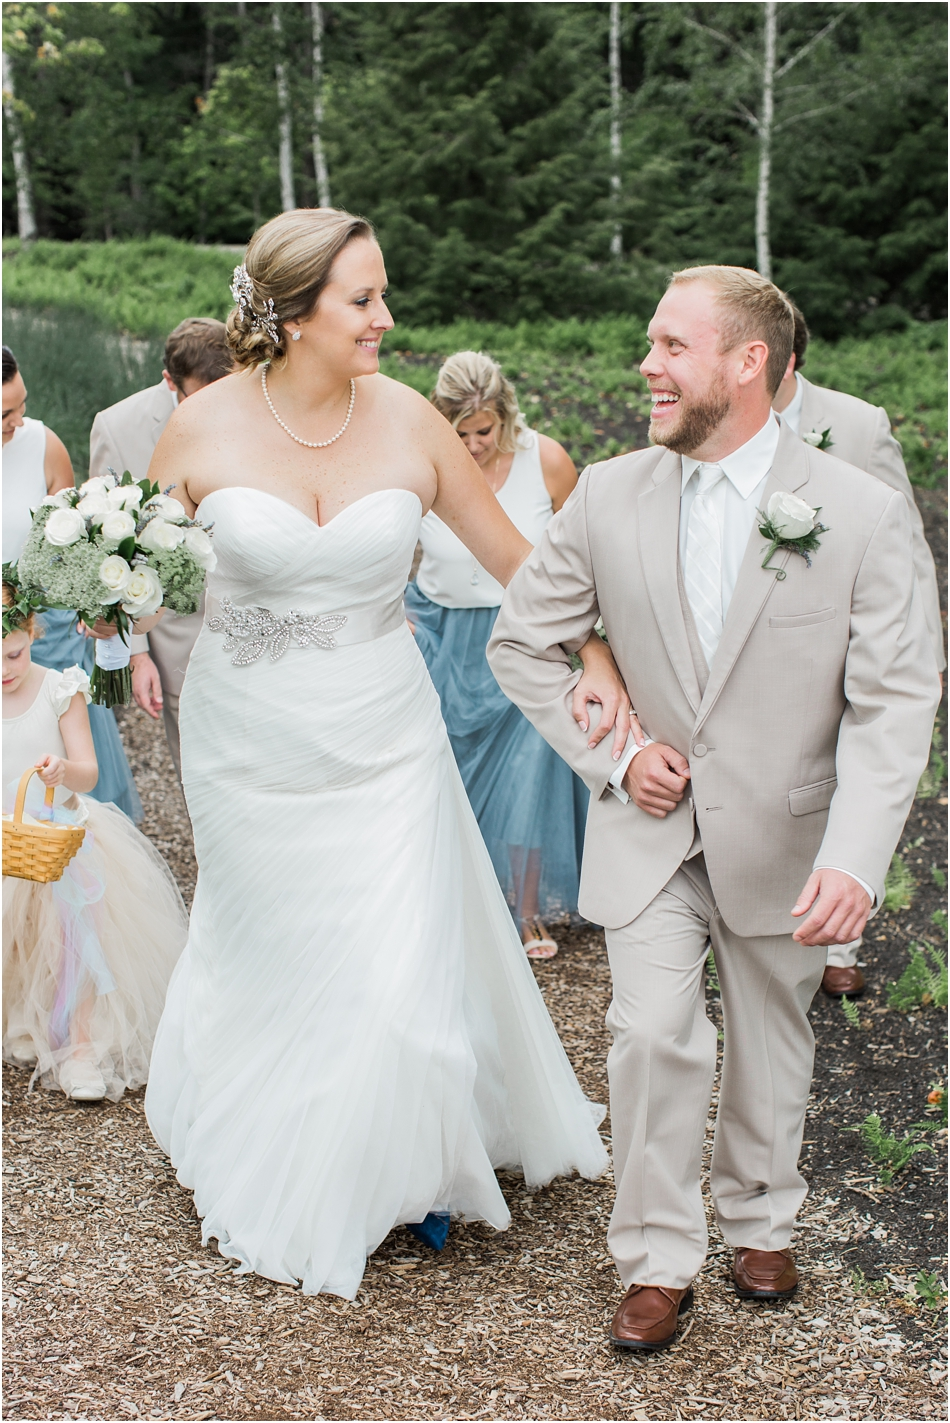 alnoba_marie_kevin_new_hampshire_boston_massachusetts_cape_cod_new_england_wedding_photographer_Meredith_Jane_Photography_photo_1991.jpg